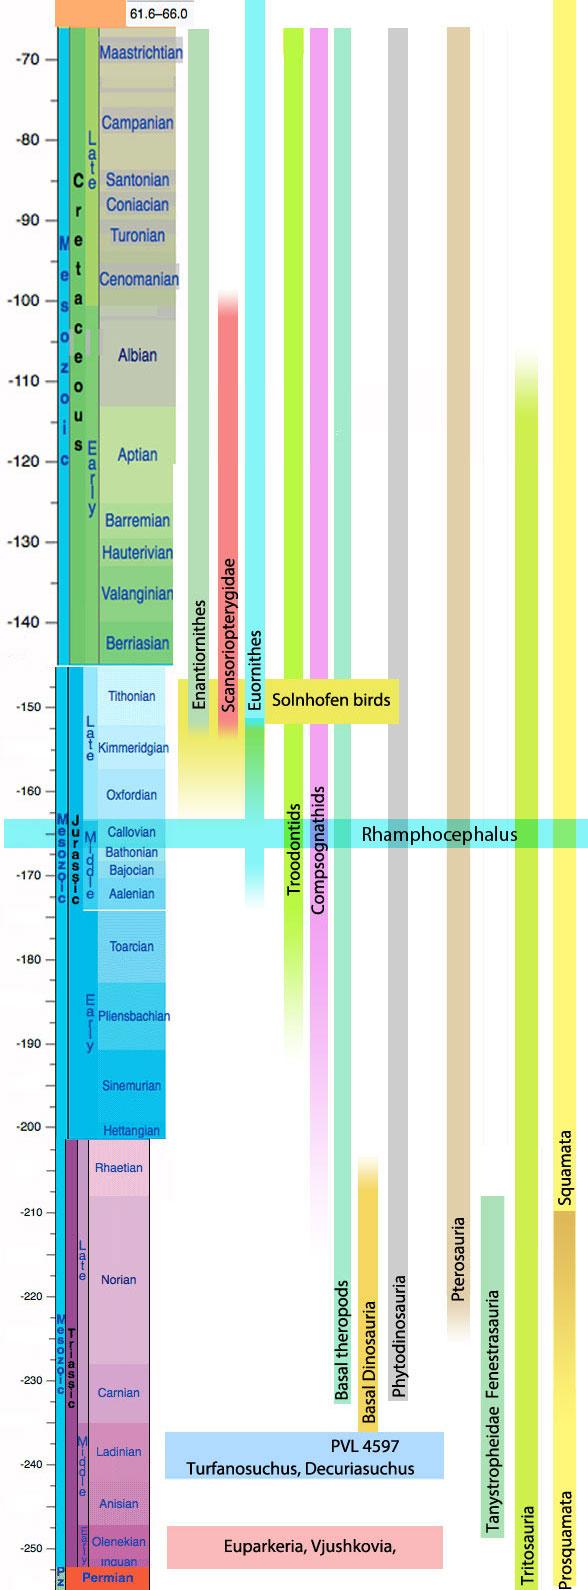 Figure 6. Rhamphocephalus chronologically precedes the Solnhofenbirds by several million years making it the oldest known bird.